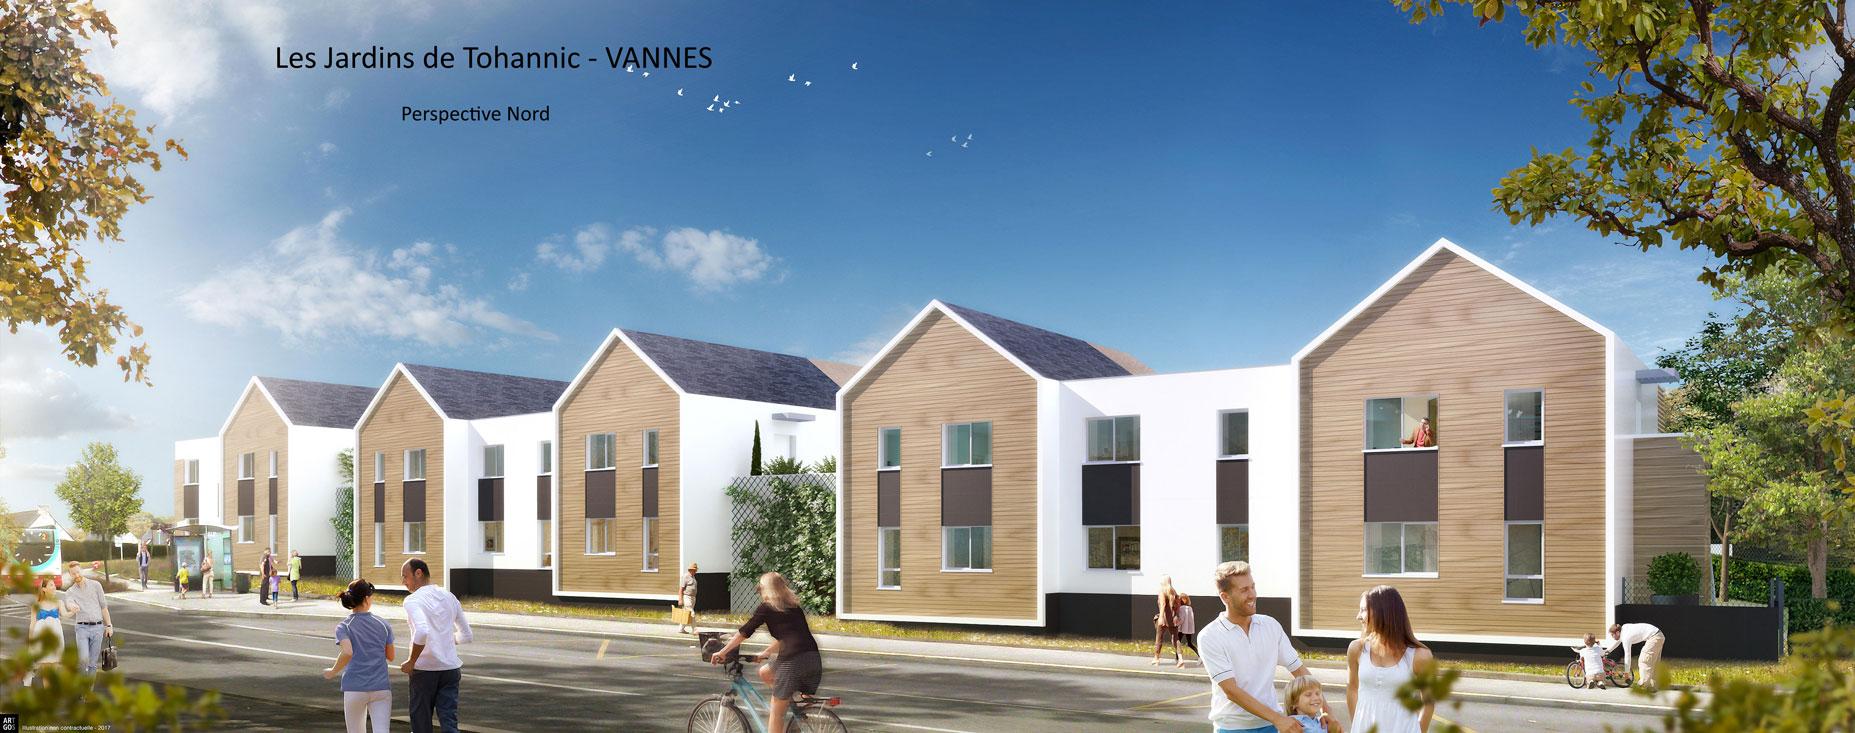 Programme maison neuve vannes ventana blog for Programme maisons neuves